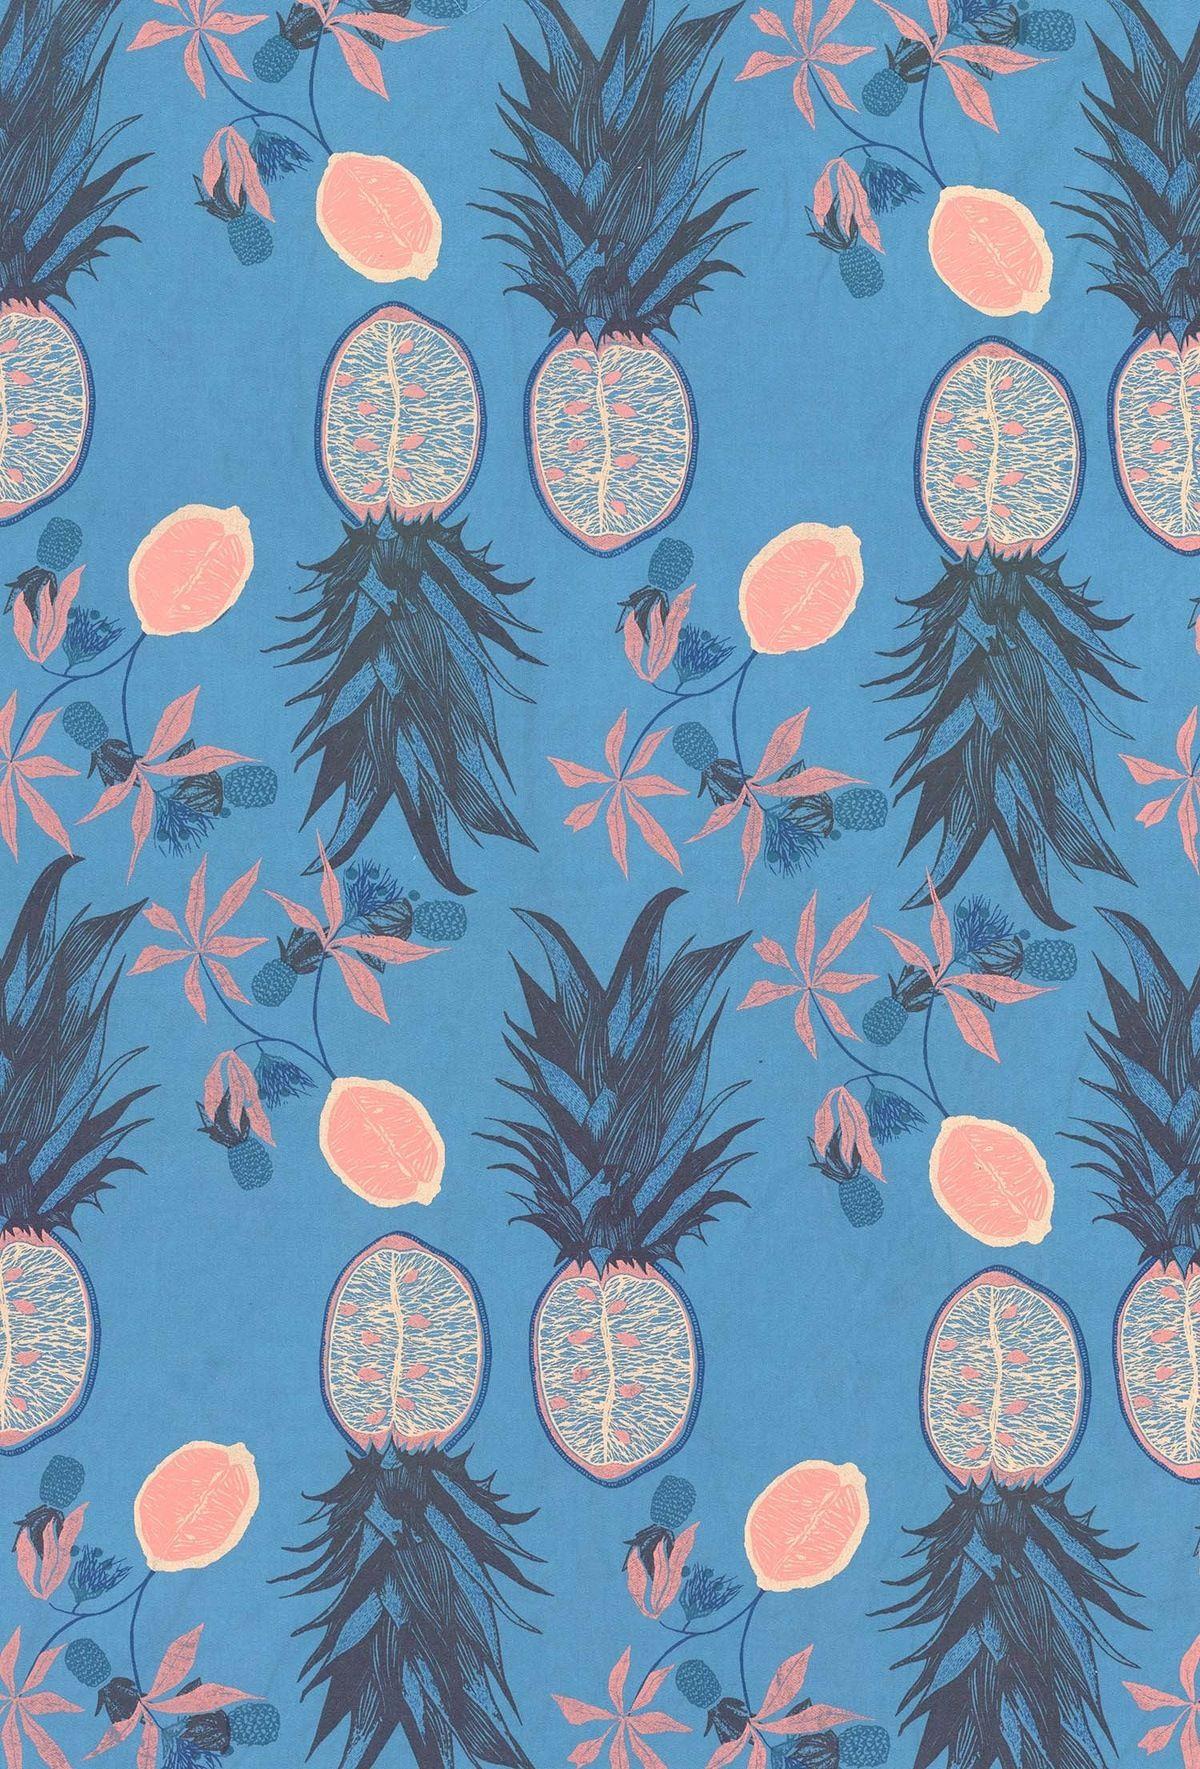 Pineapple and guava | Prints, Print patterns, Pattern art